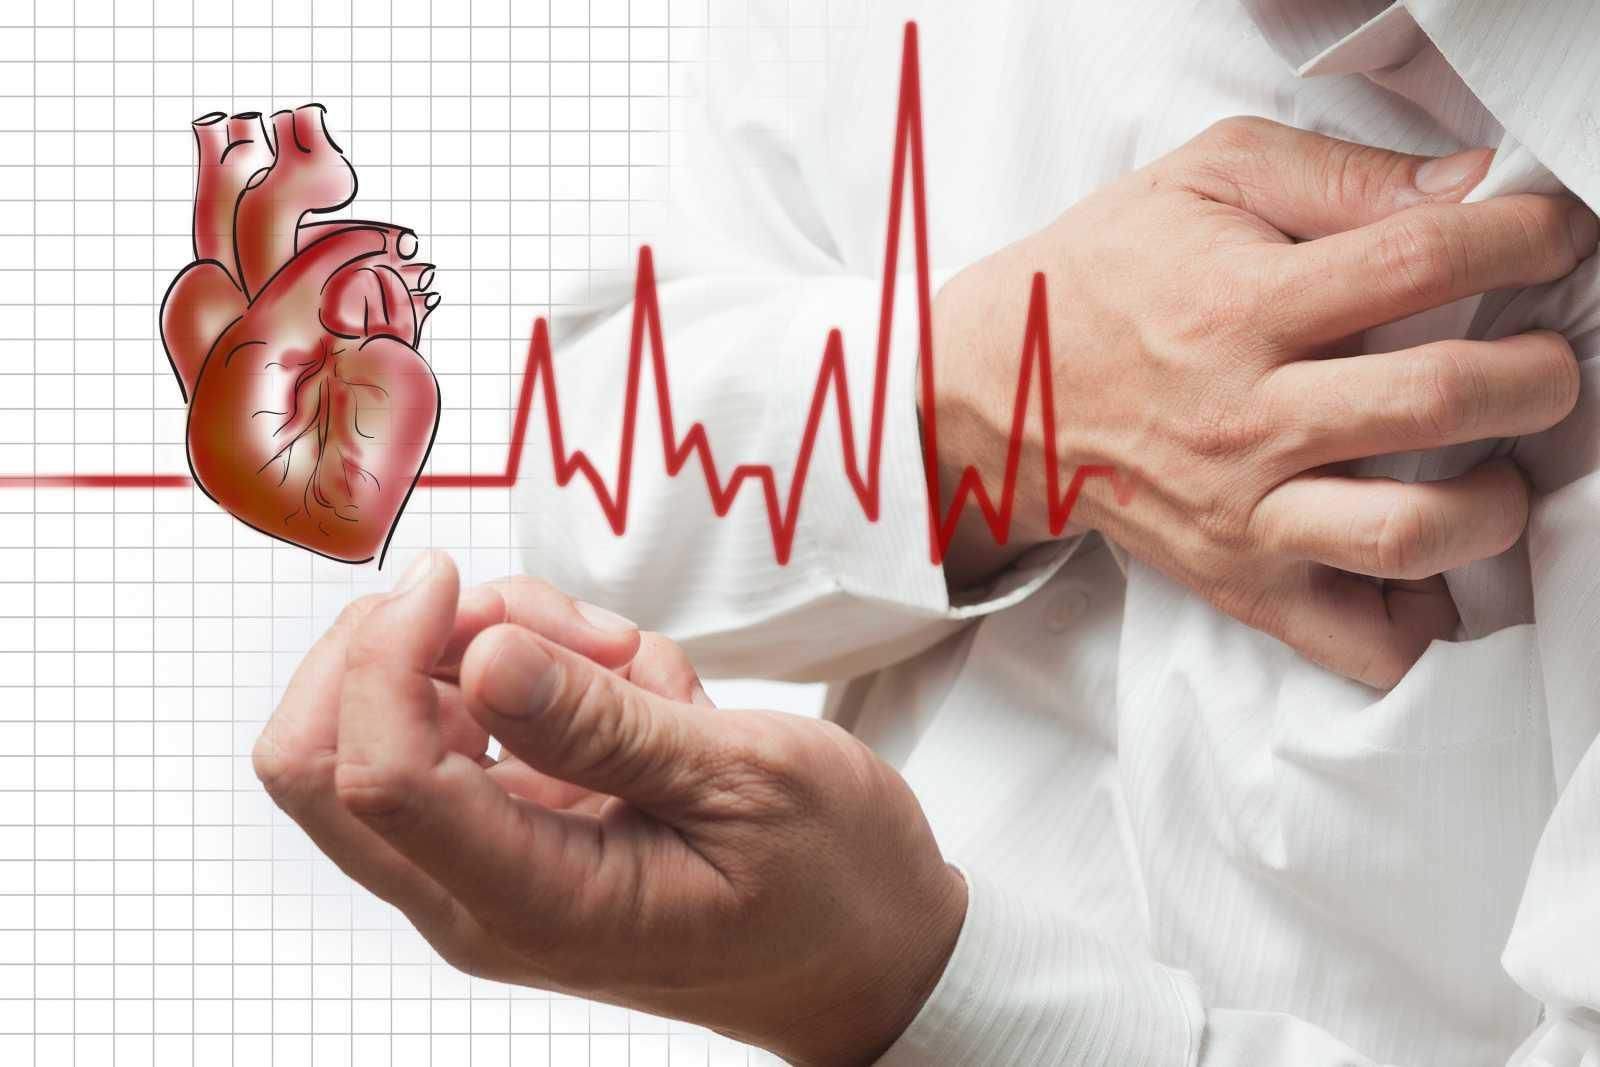 Стенокардия: как унять сердечный приступ